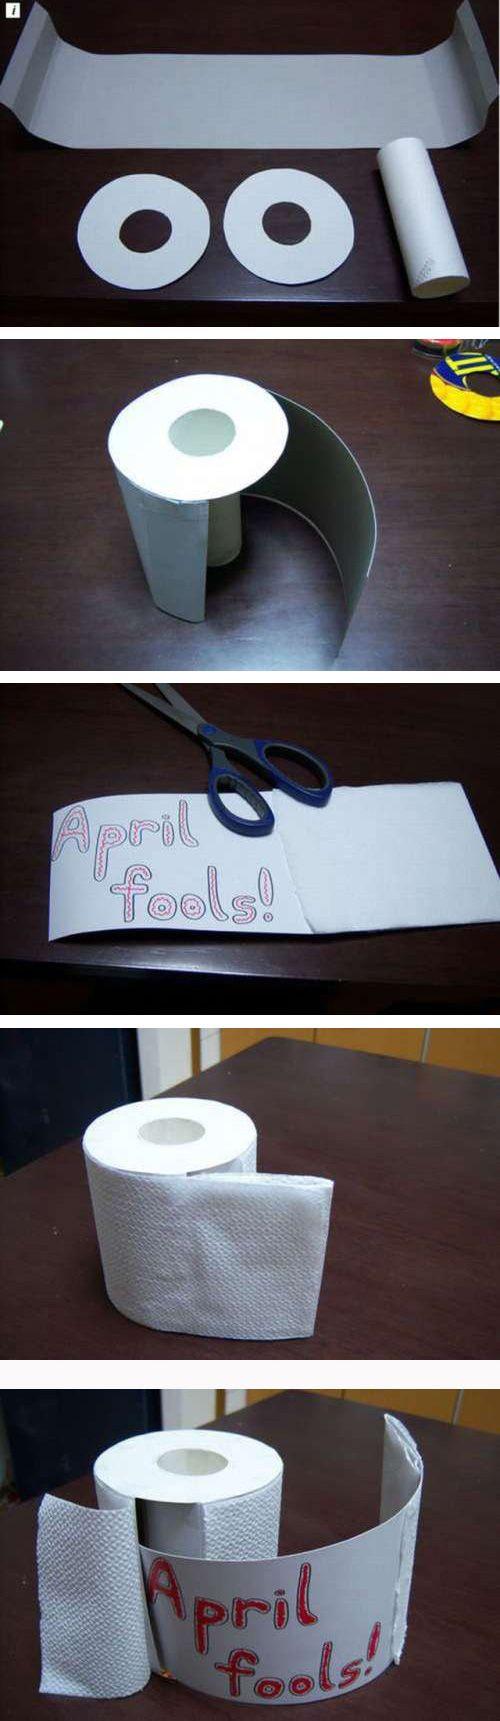 April Fools Day Prank. Lol